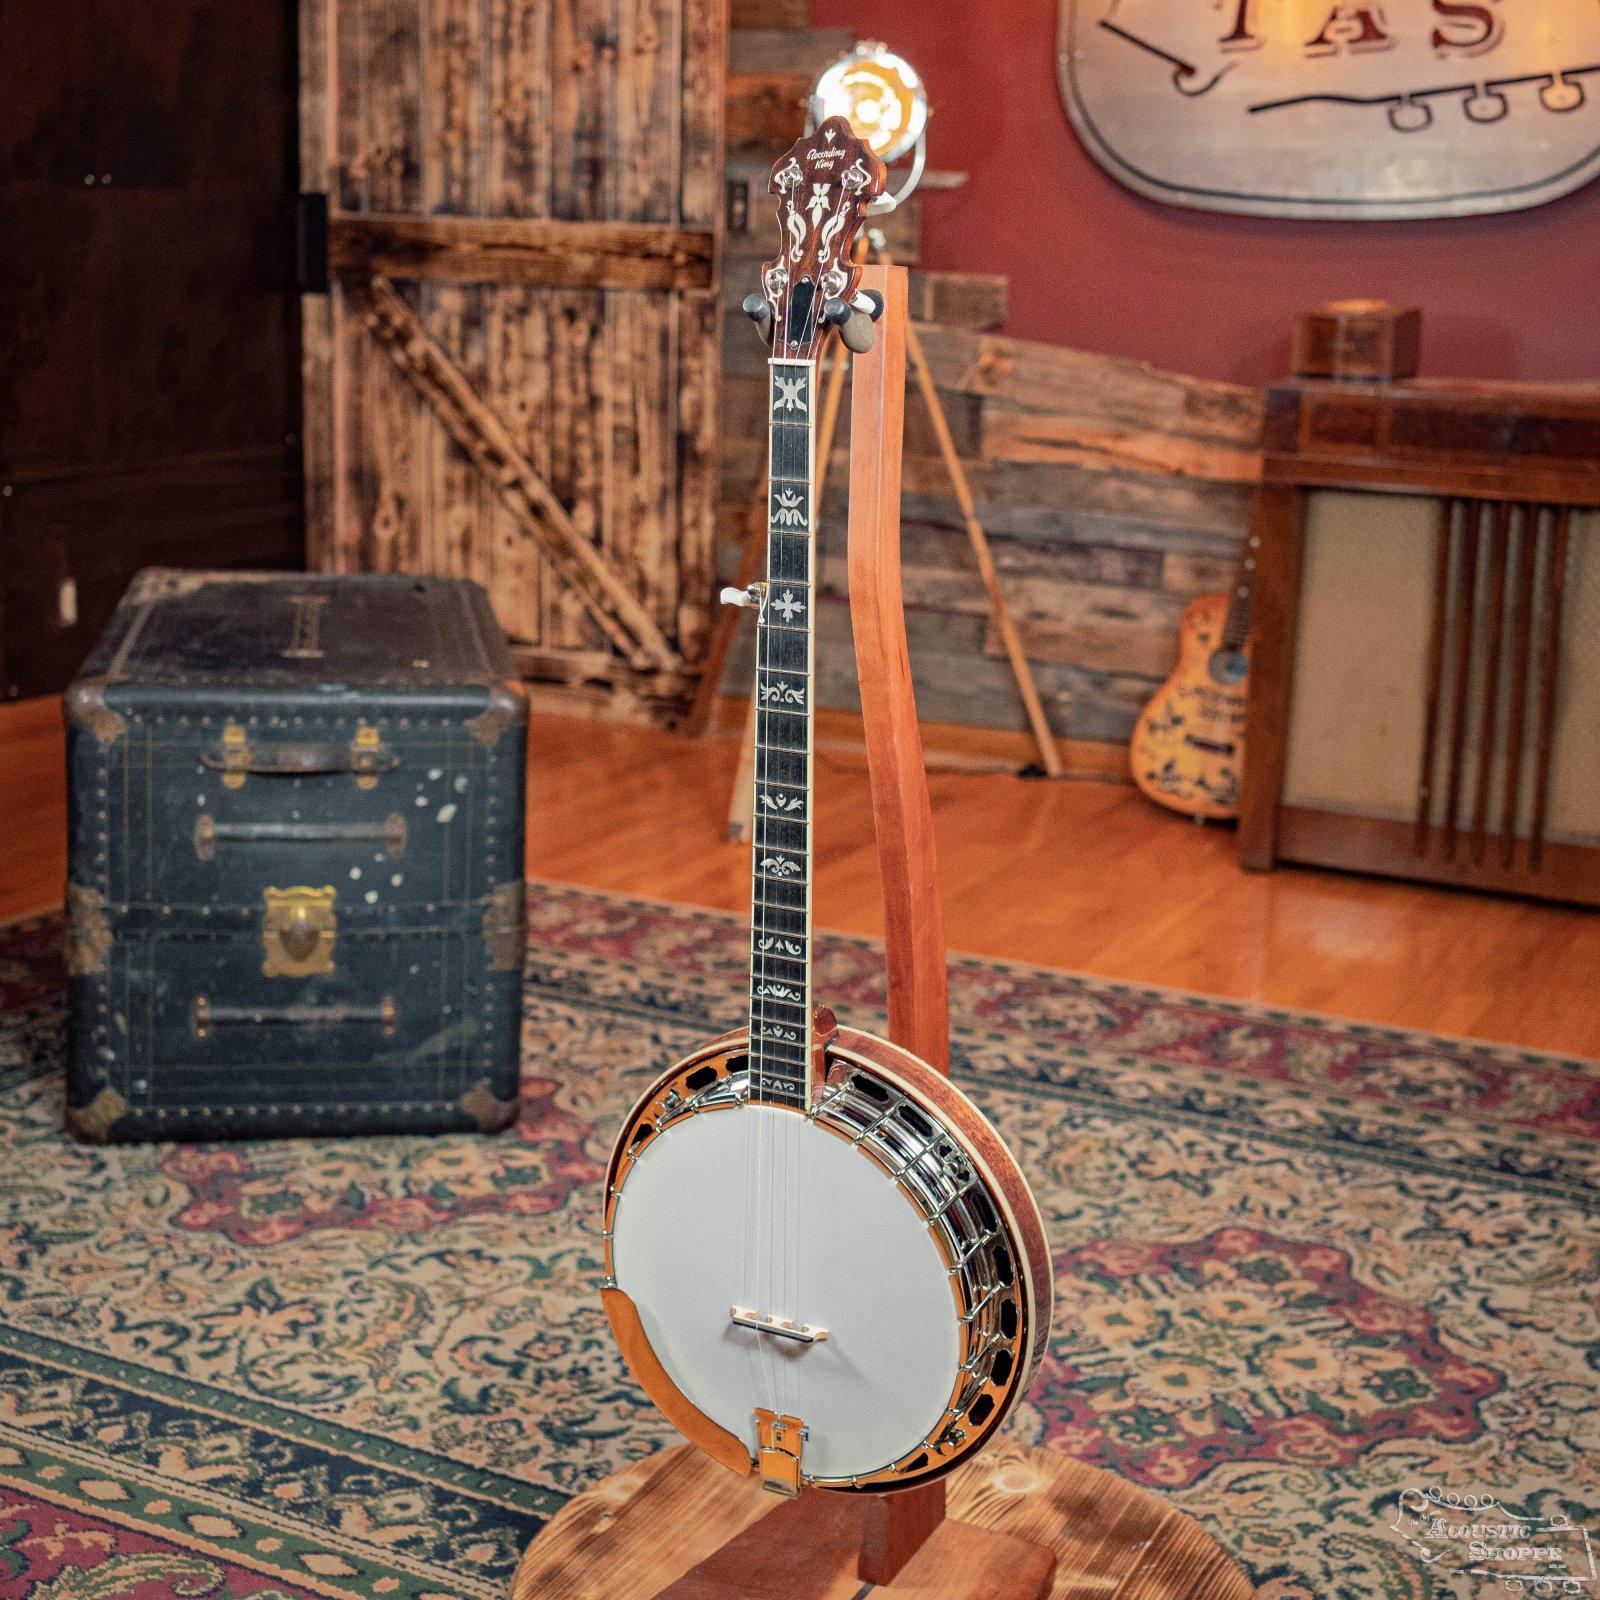 Recording King RK-ELITE-75 The Elite Flying Eagle Resonator Banjo #0252